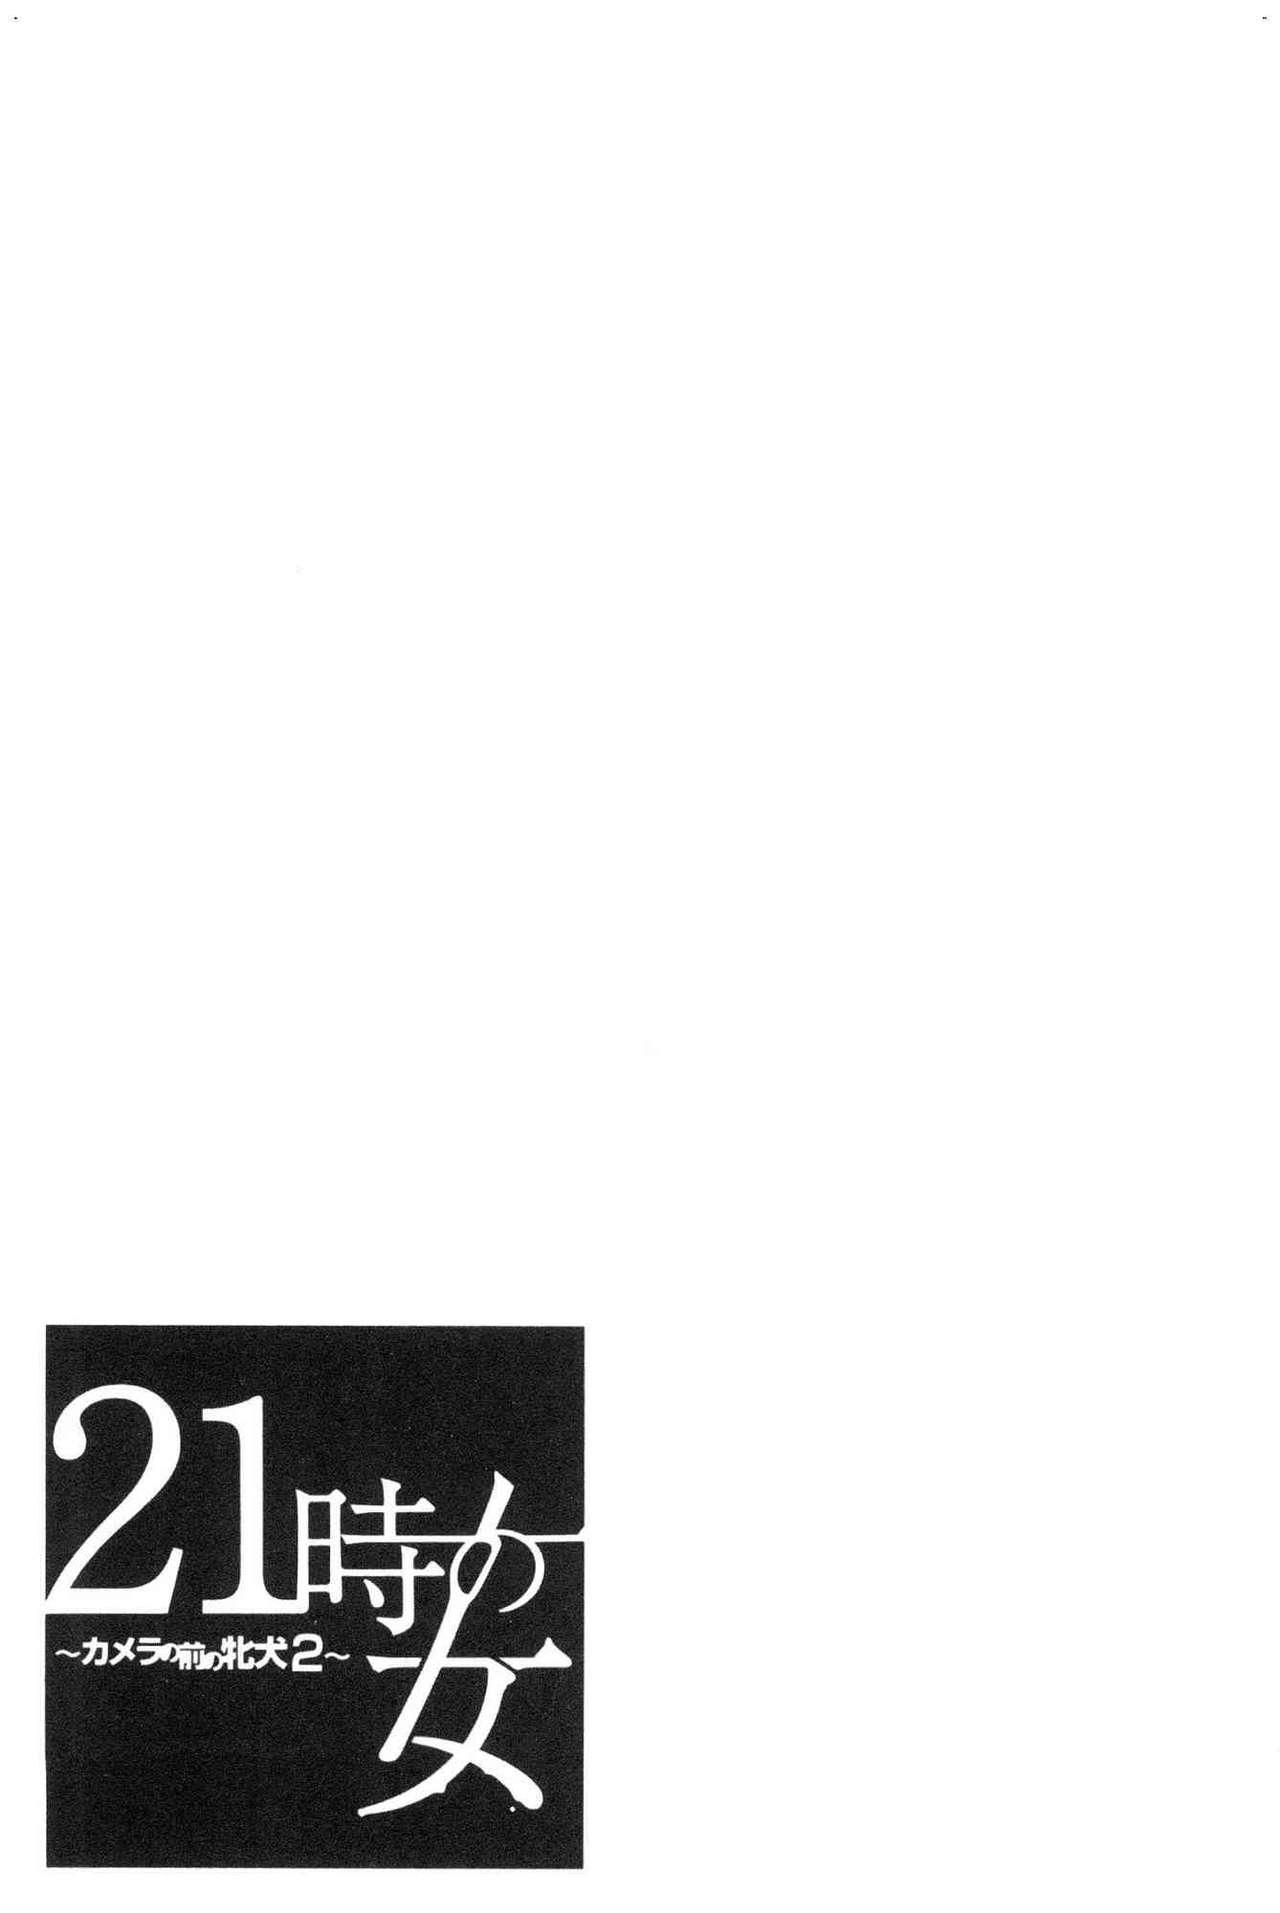 [Gotoh Akira]  21-ji no Onna ~Camera no Mae no Mesuinu~ 2 | 21時之女 ~鏡頭前的牝犬~ 2 [Chinese] 136